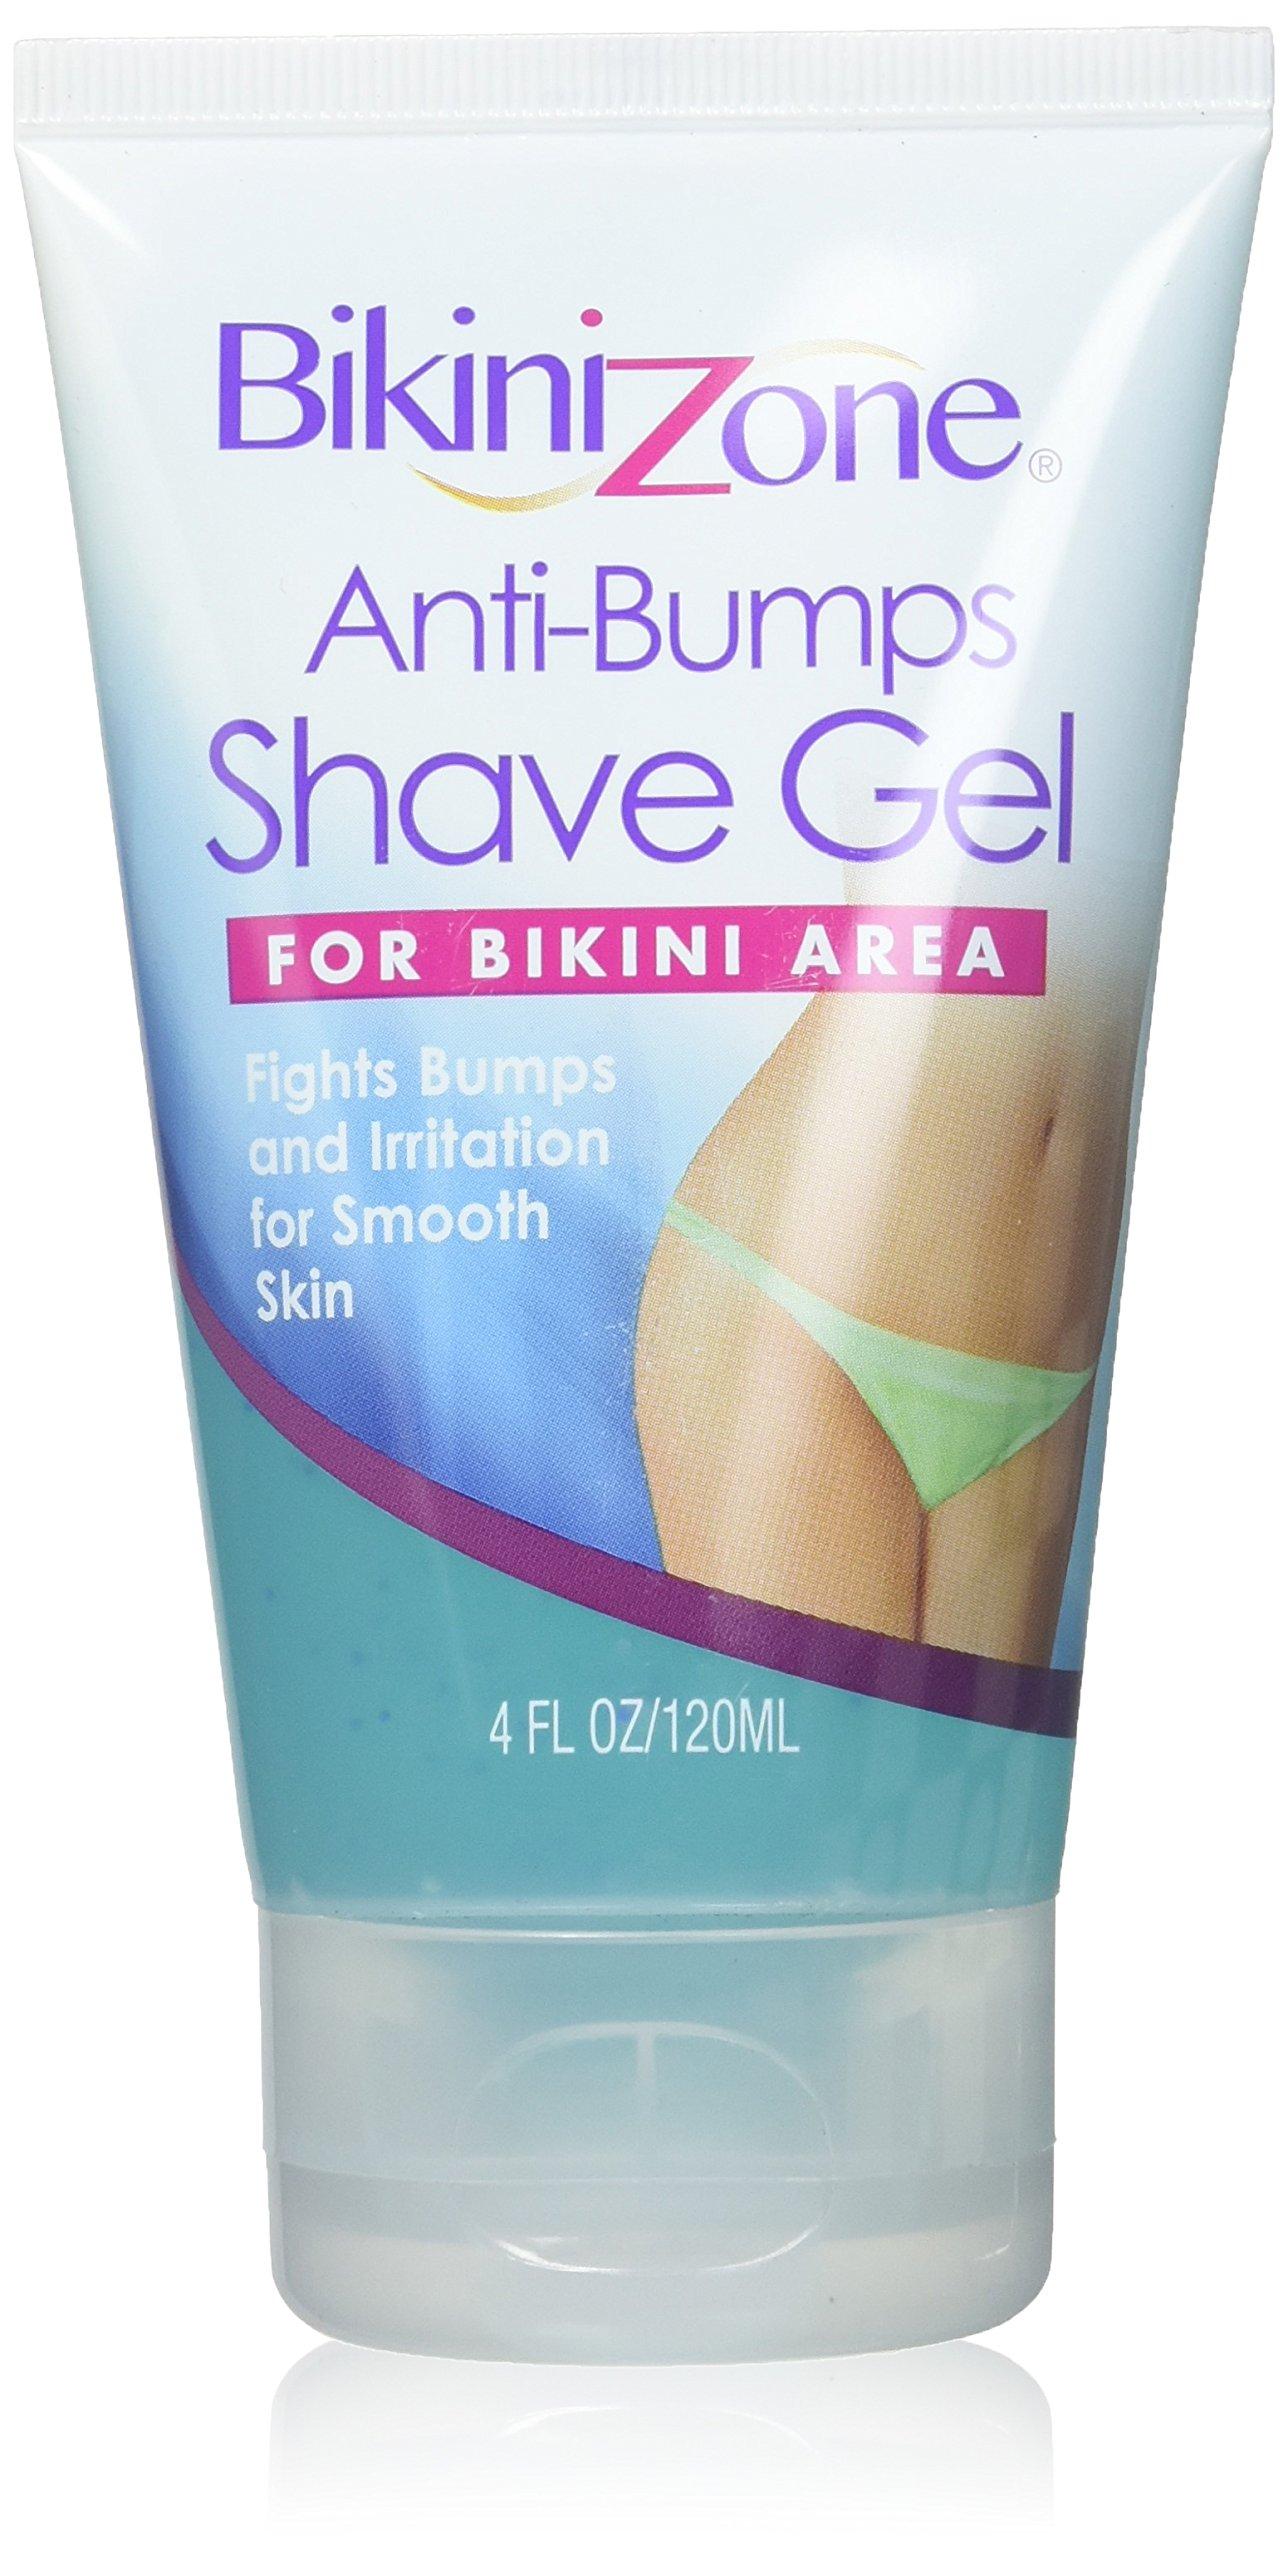 Bikini Zone Shave Gel Anti-Bumps, 4 Ounce (3 Pack)